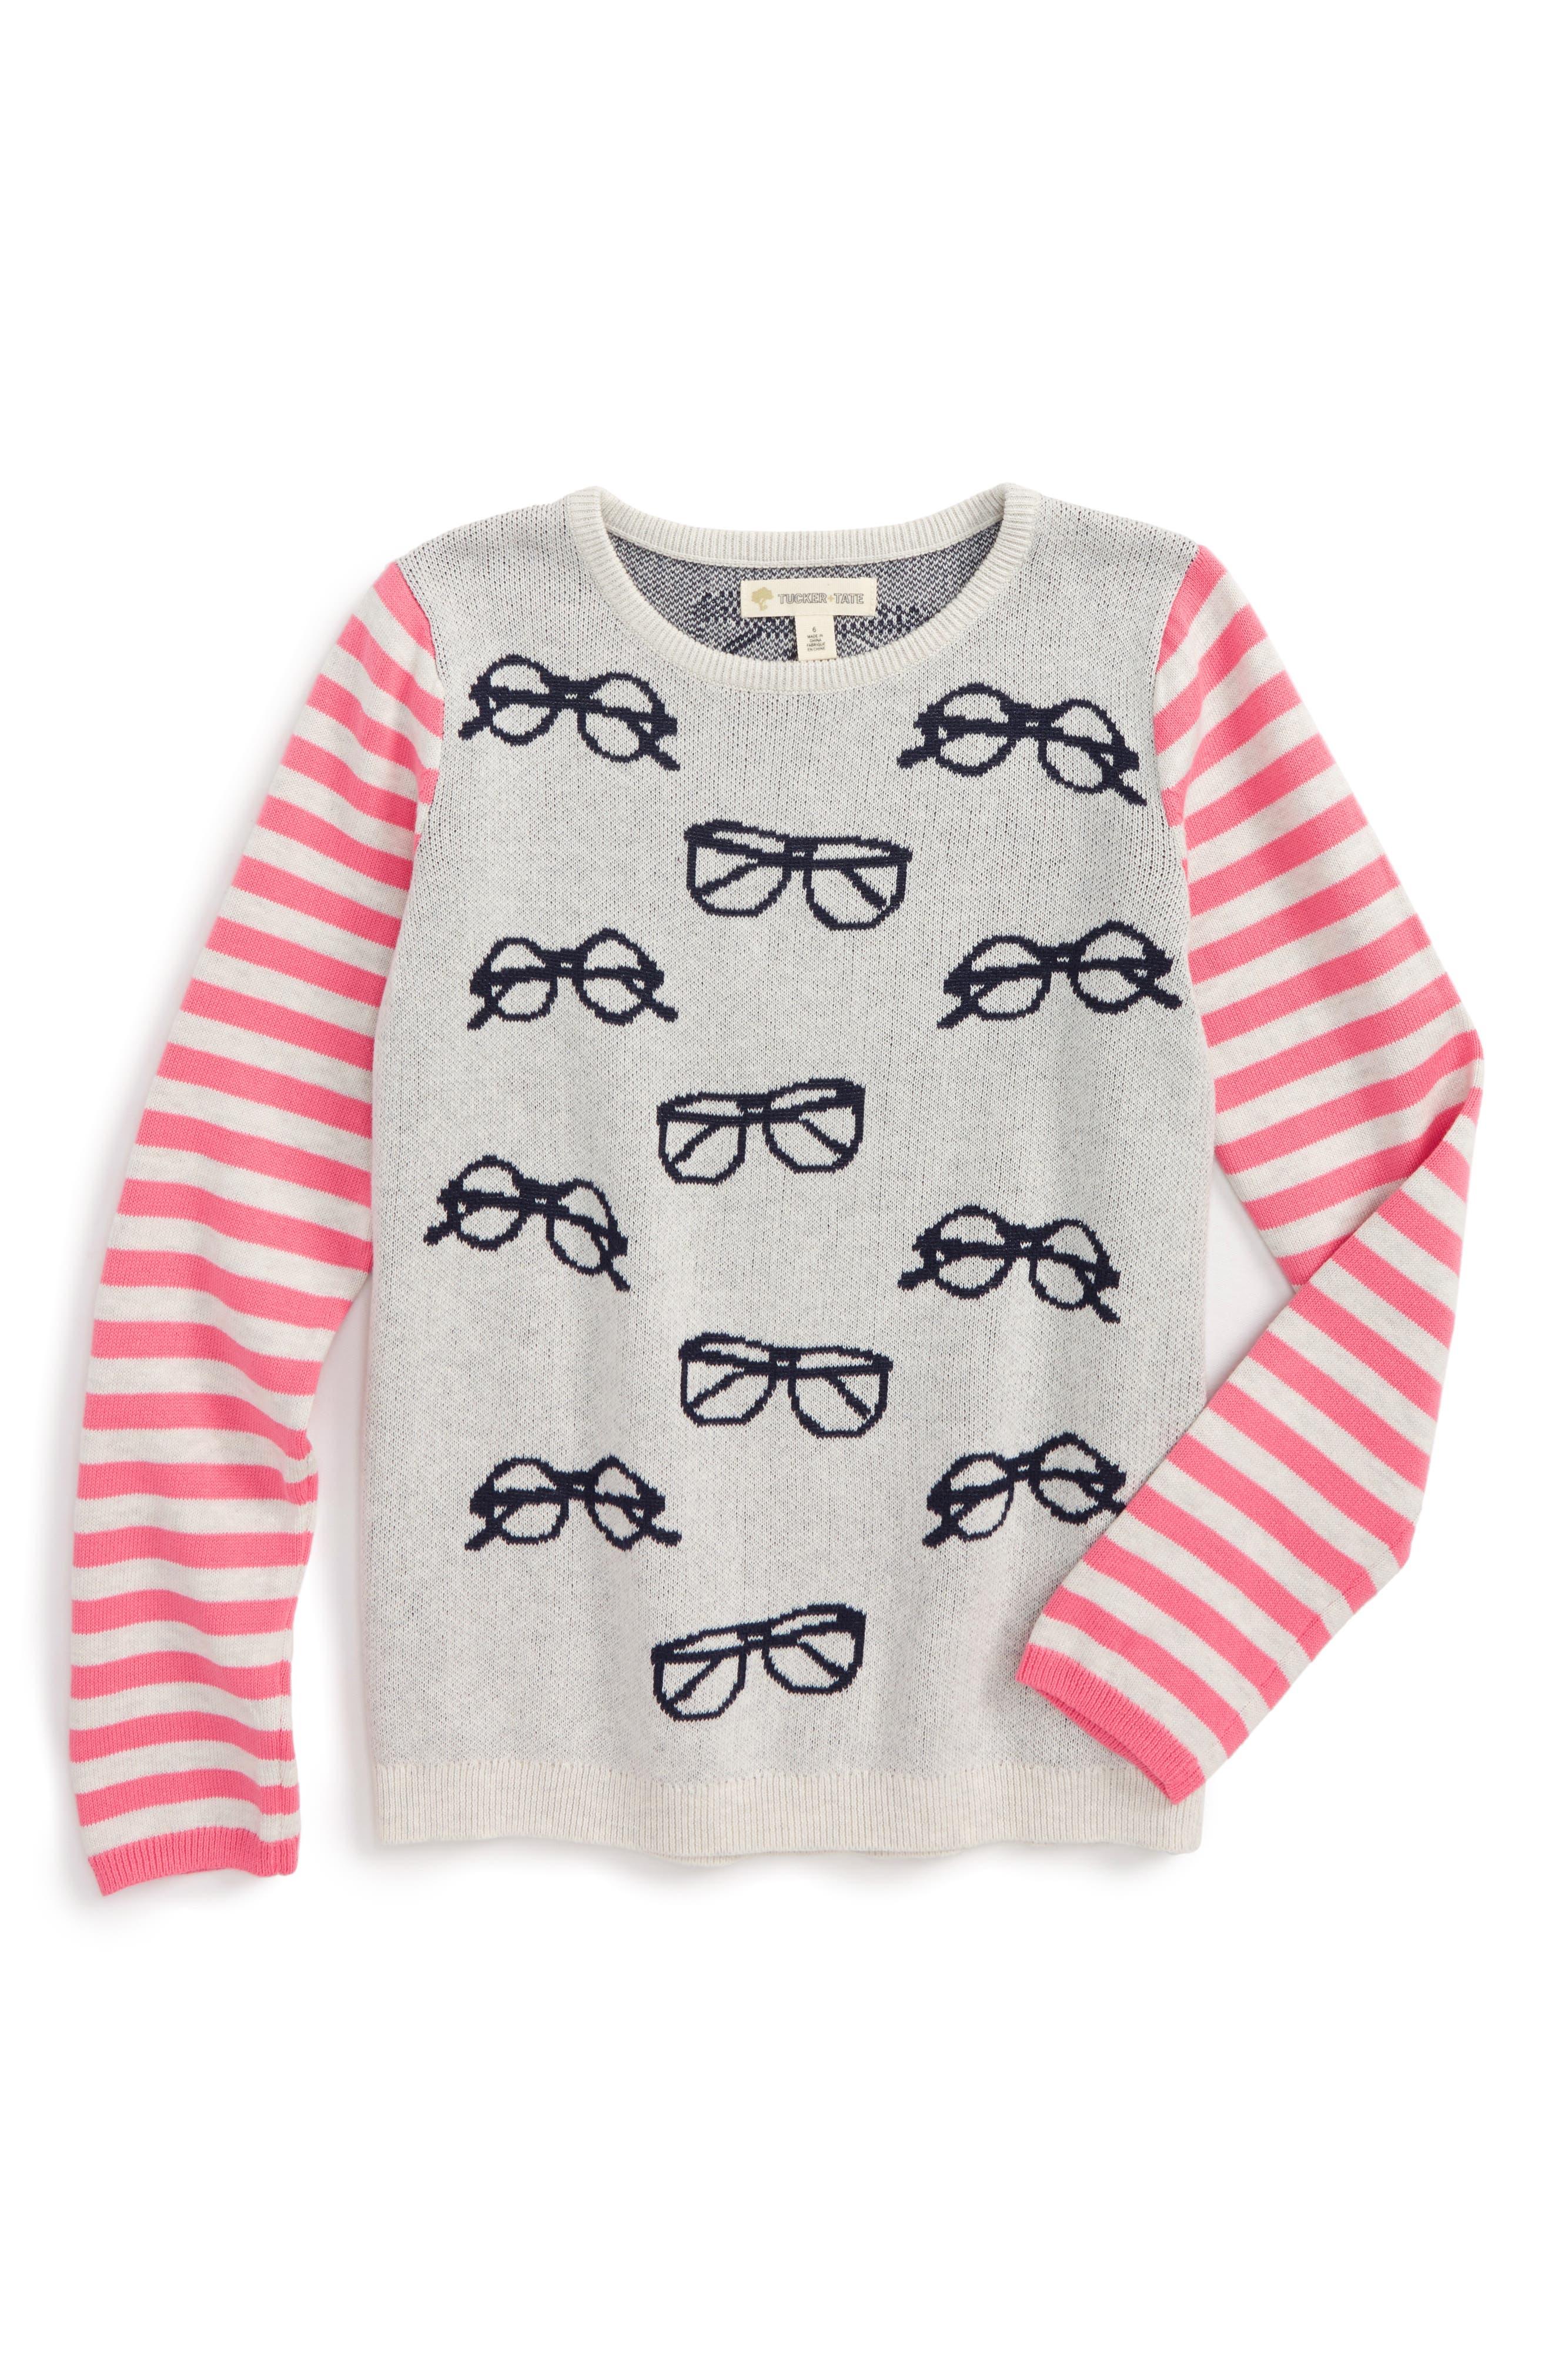 Alternate Image 1 Selected - Tucker + Tate Print Sweater (Toddler Girls, Little Girls & Big Girls)